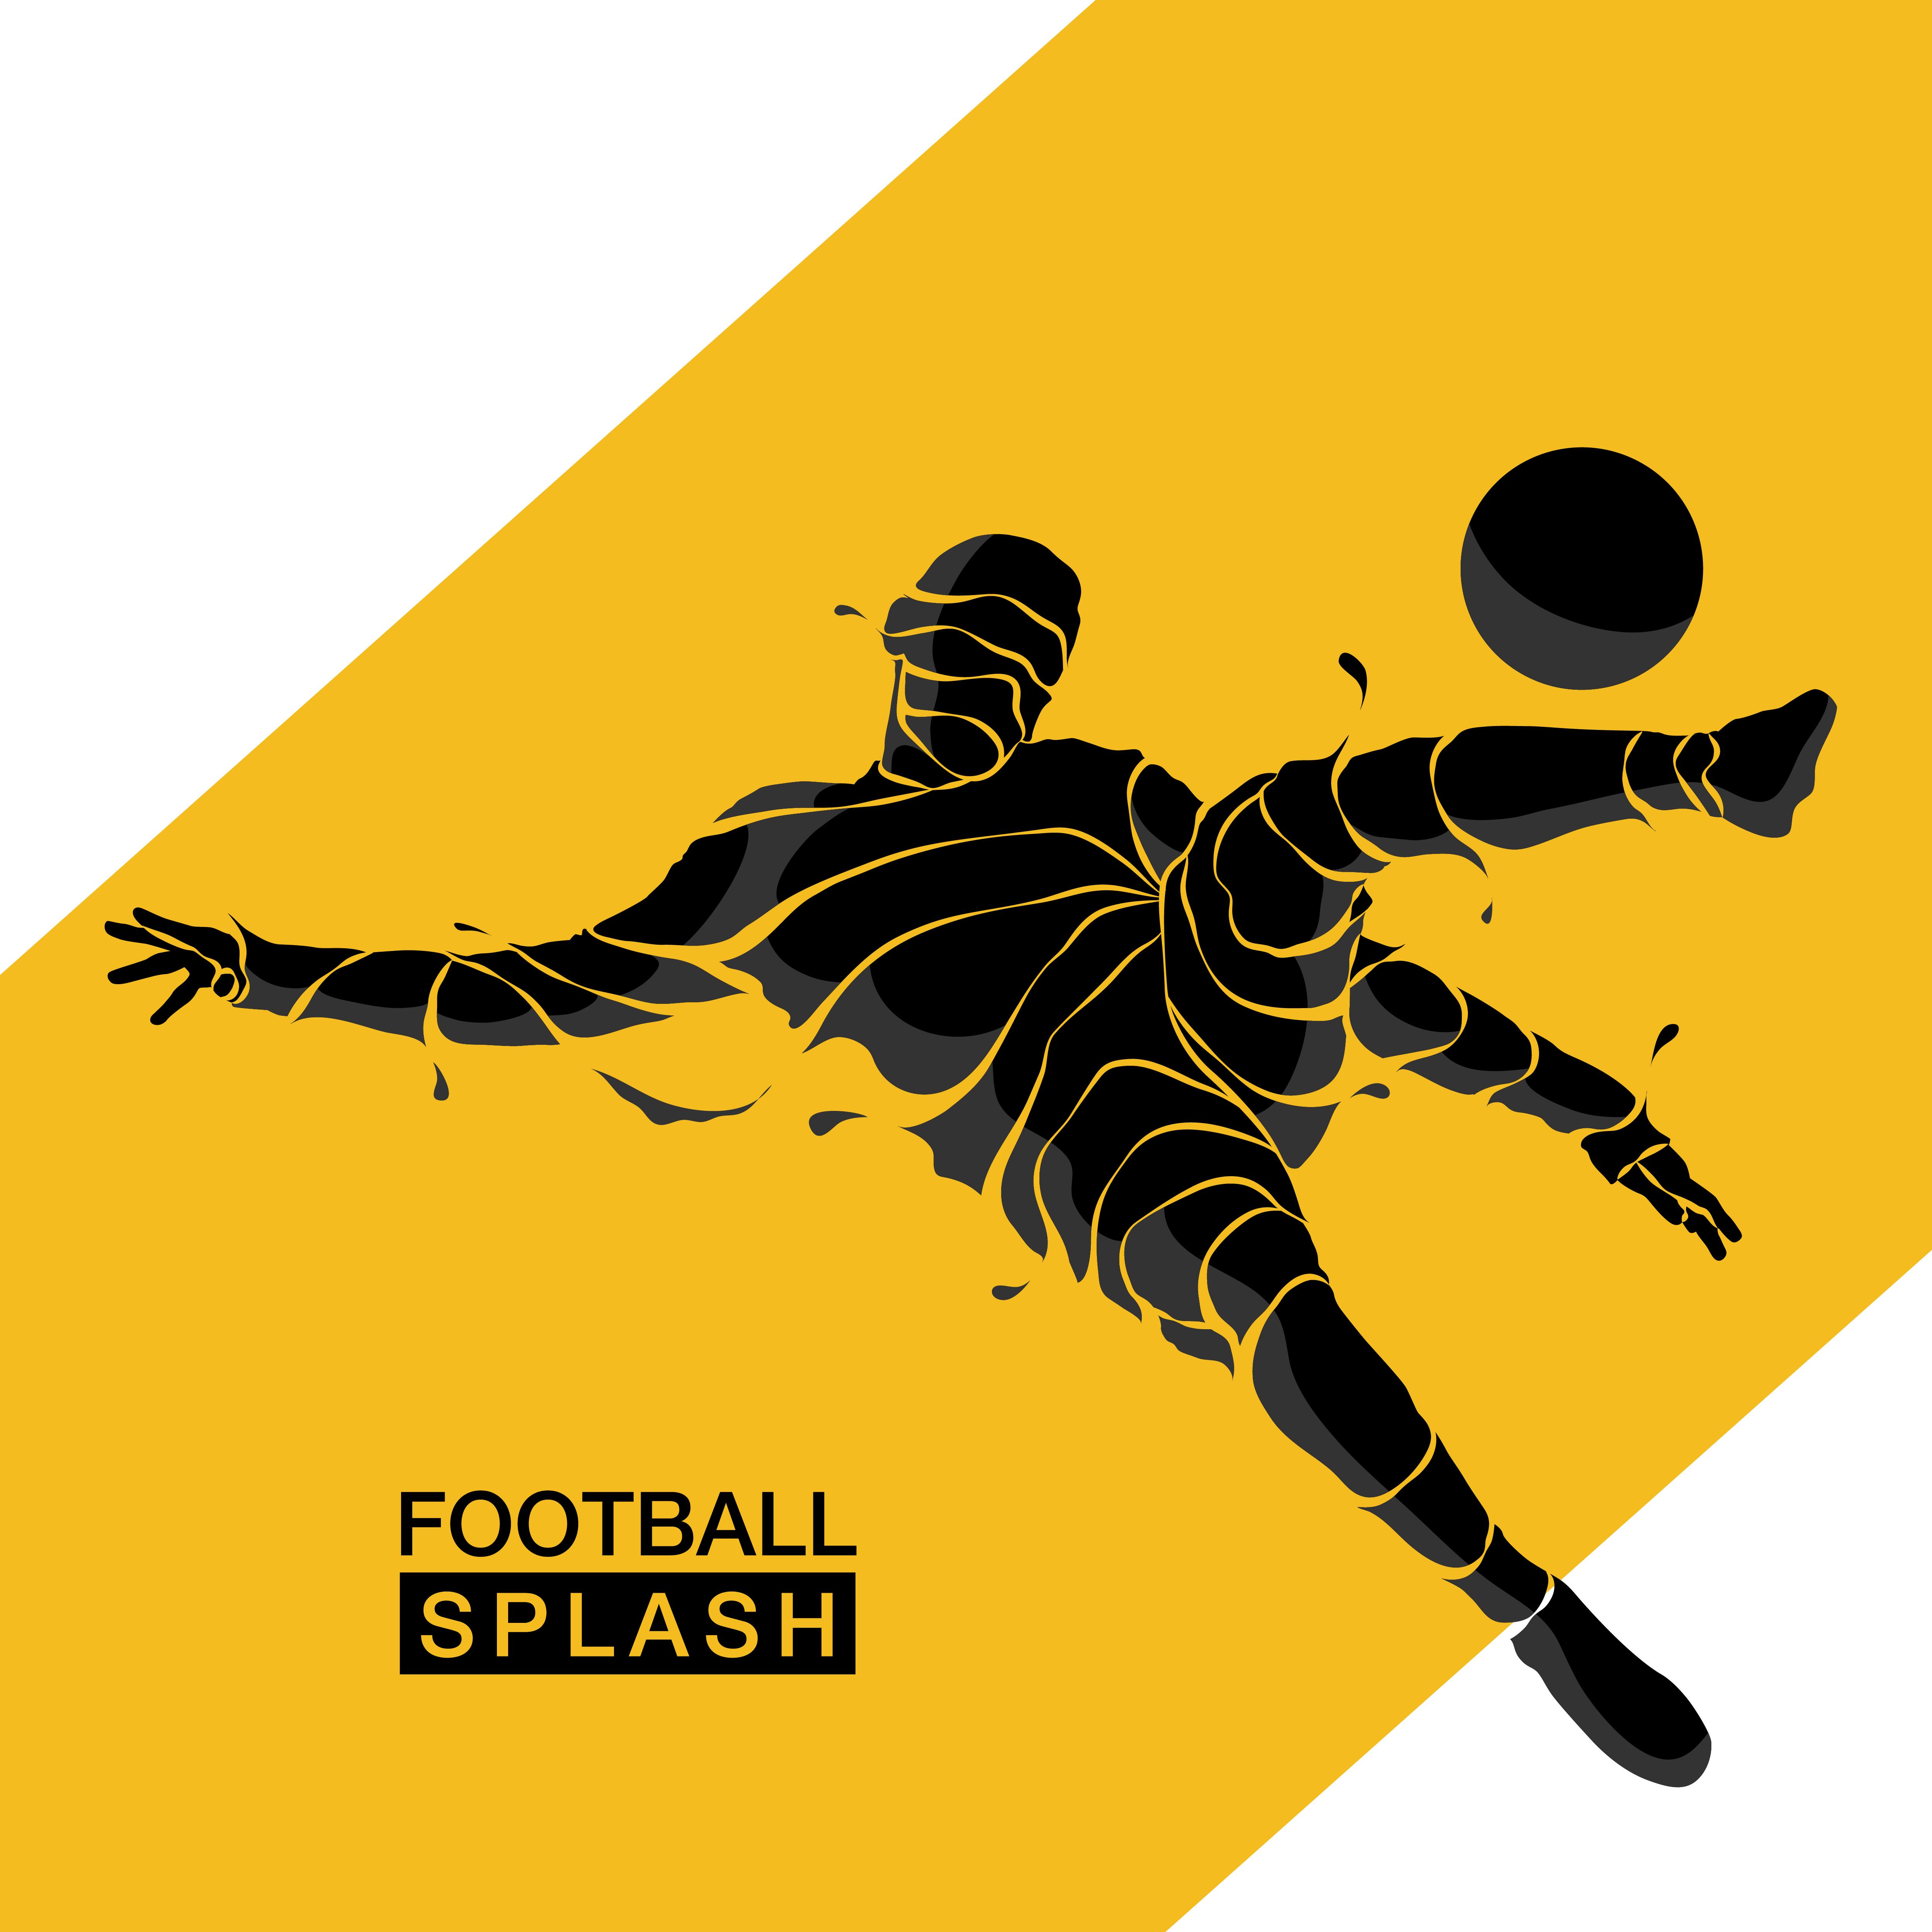 football soccer splash silhouette 641338 - Download Free ...